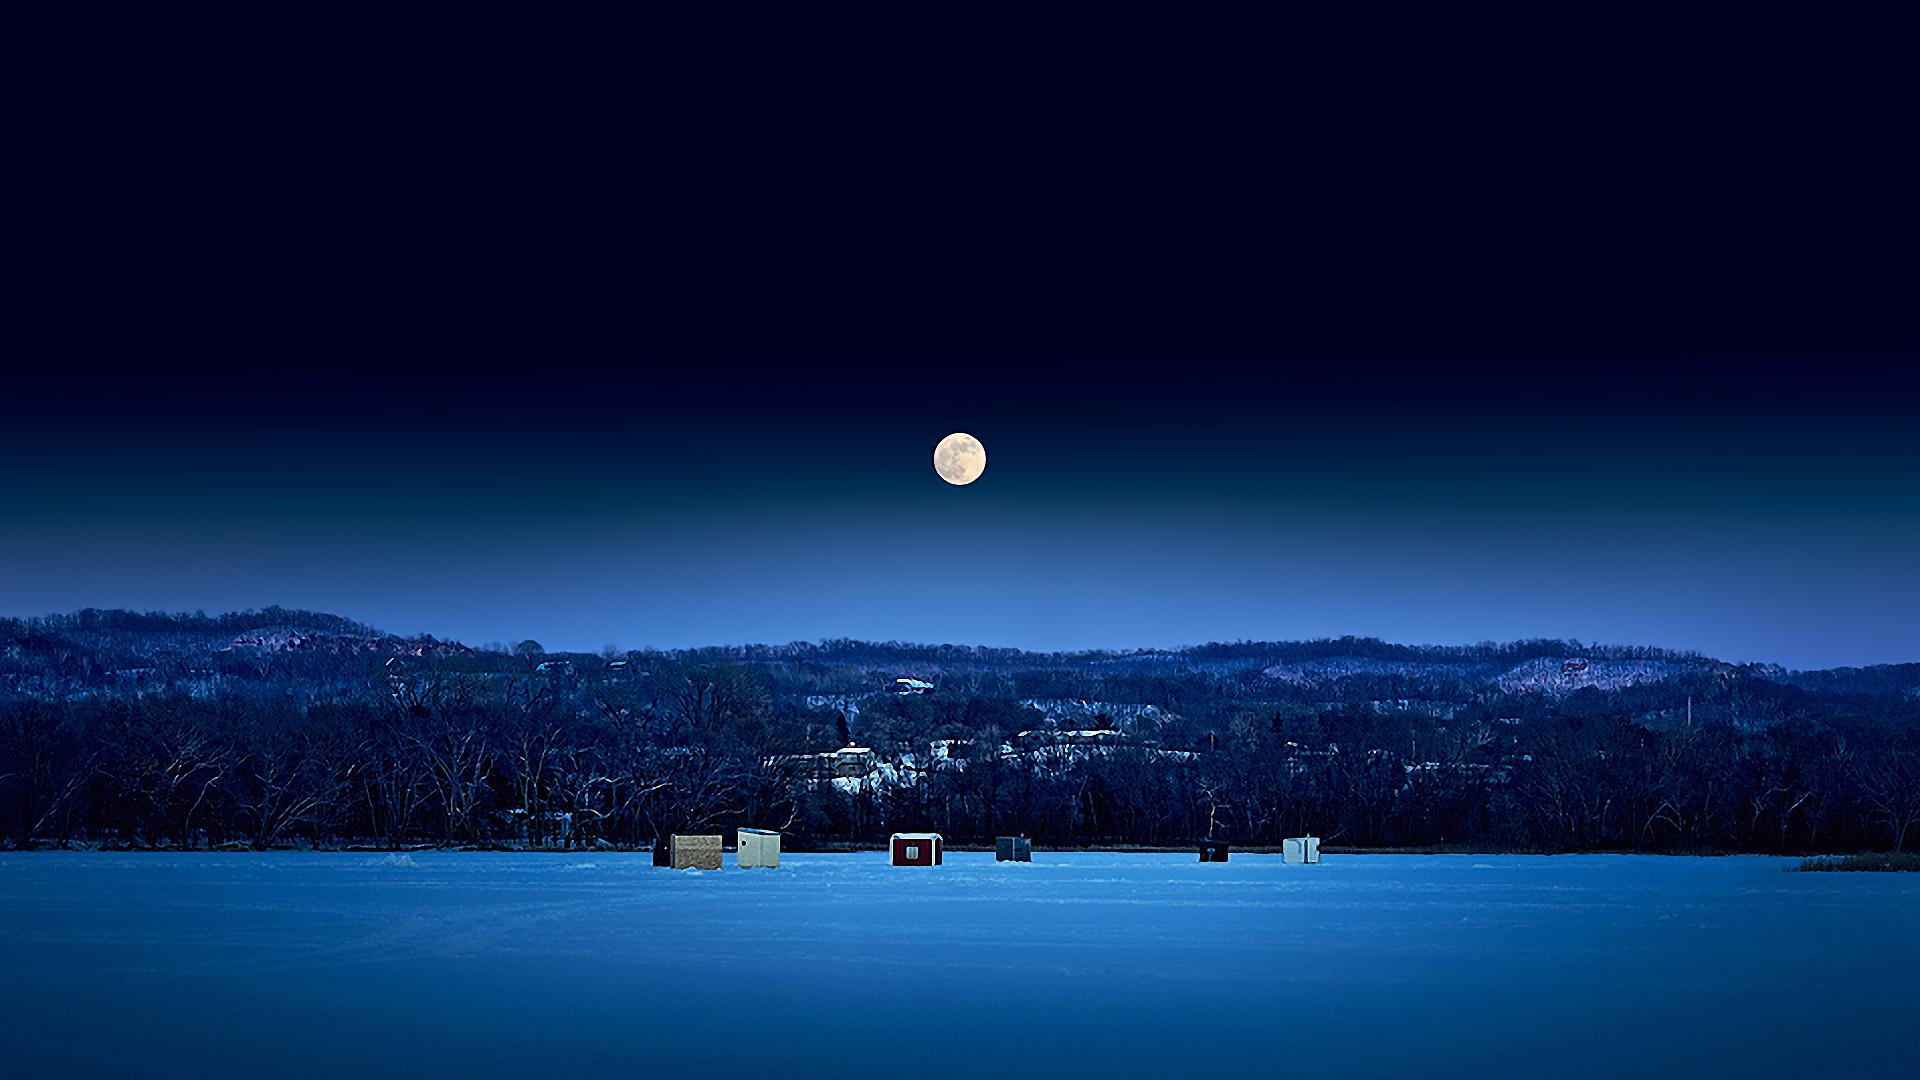 Beautiful Winter Night Wallpaper 1920x1080